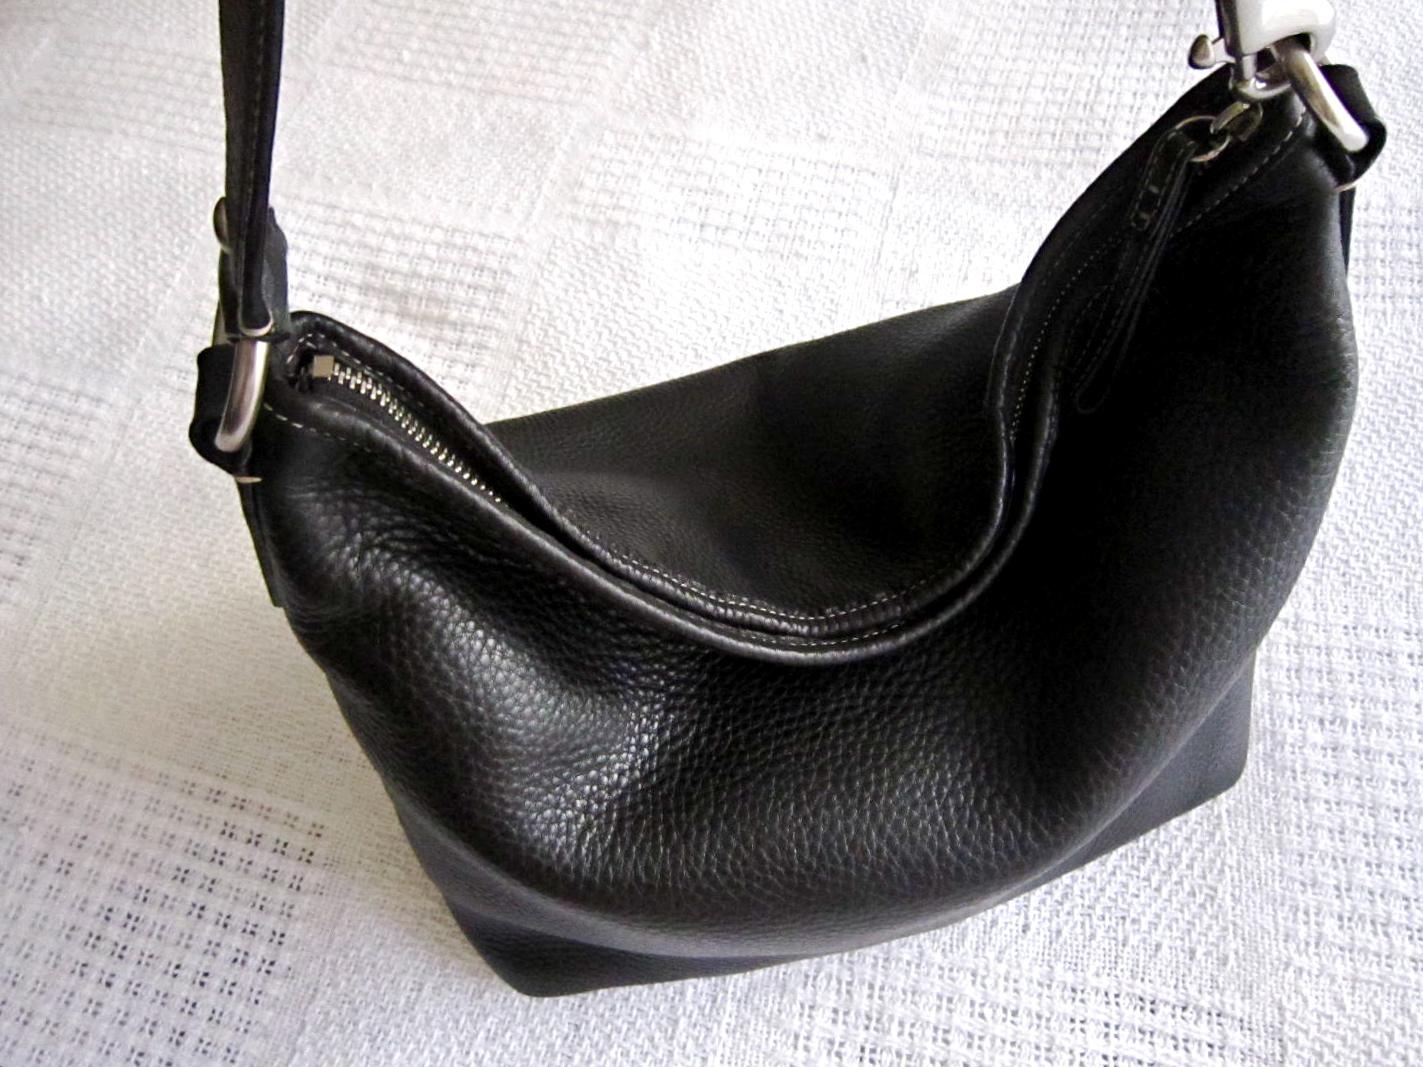 a5c2c633a Coach Black Pebble Leather Hobo Bag - Luxurylana Boutique